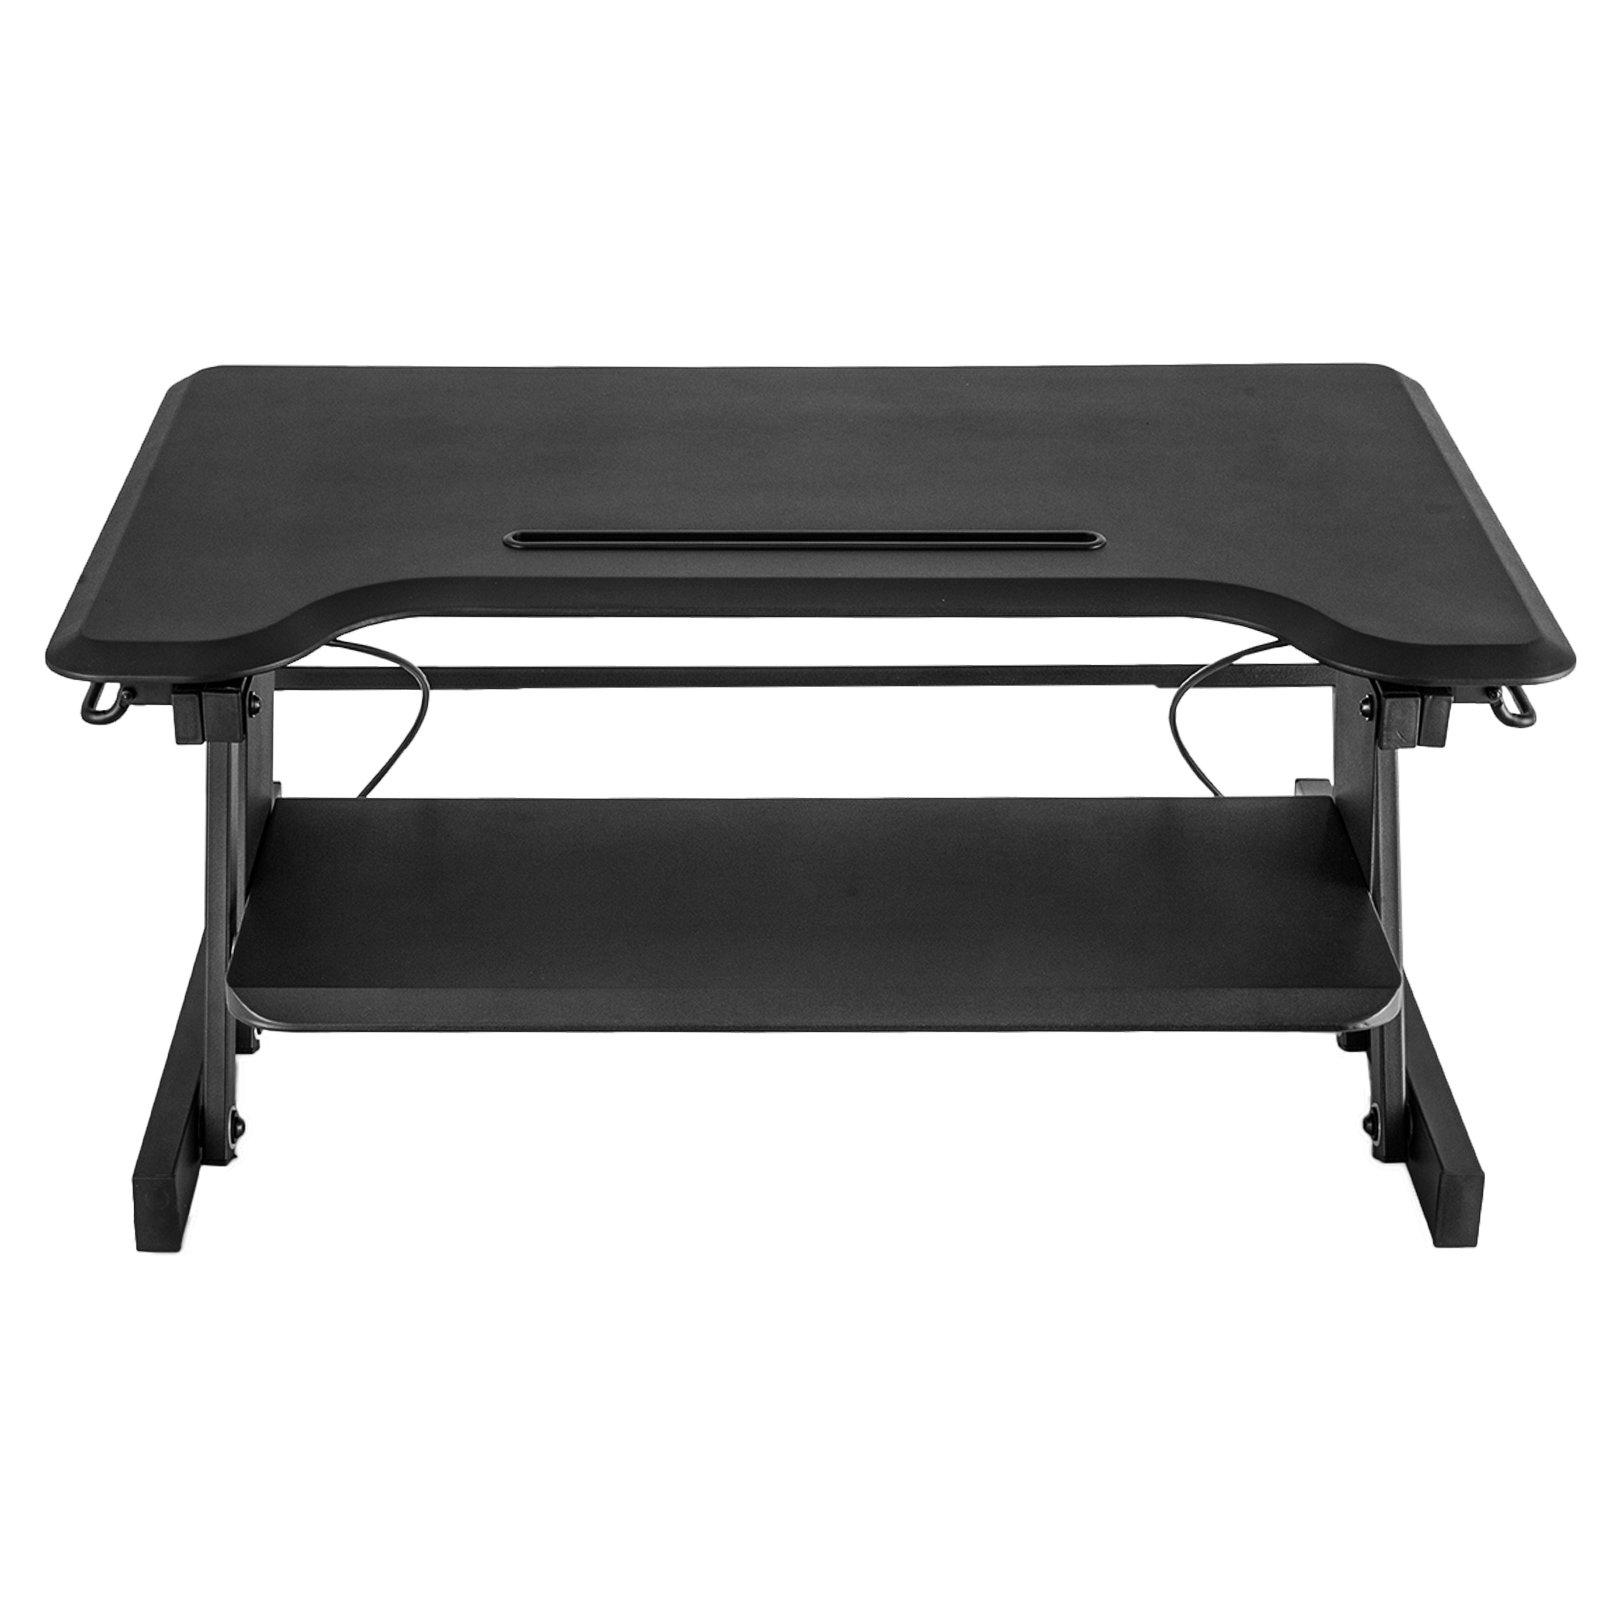 Mophorn 32'' Height Adjustable Standing Desk Converter with Keyboard Tray and Tablet Holder Design Sit to Stand Desk Riser Desktop Tabletop Computer Workstation (with Tablet holder design)